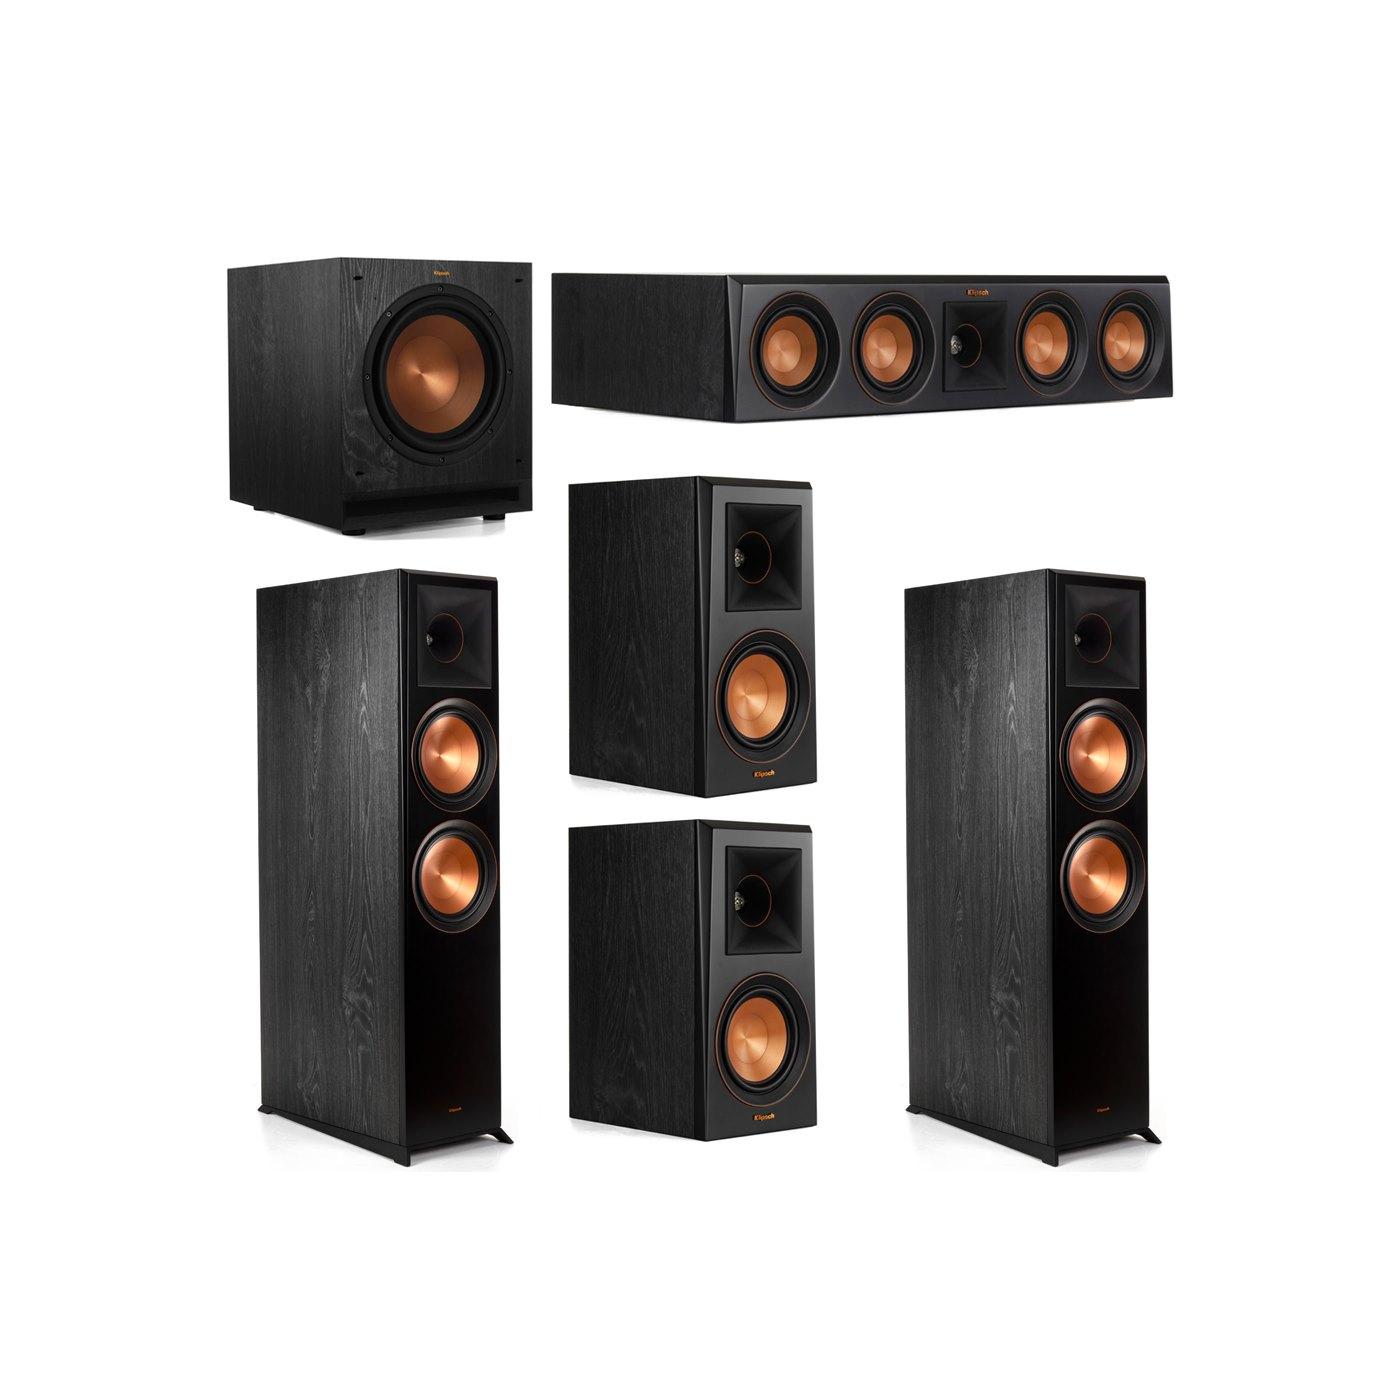 Klipsch 5.1 System with 2 RP-8000F Floorstanding Speakers, 1 Klipsch RP-404C Center Speaker, 2 Klipsch RP-500M Surround Speakers, 1 Klipsch SPL-100 Subwoofer